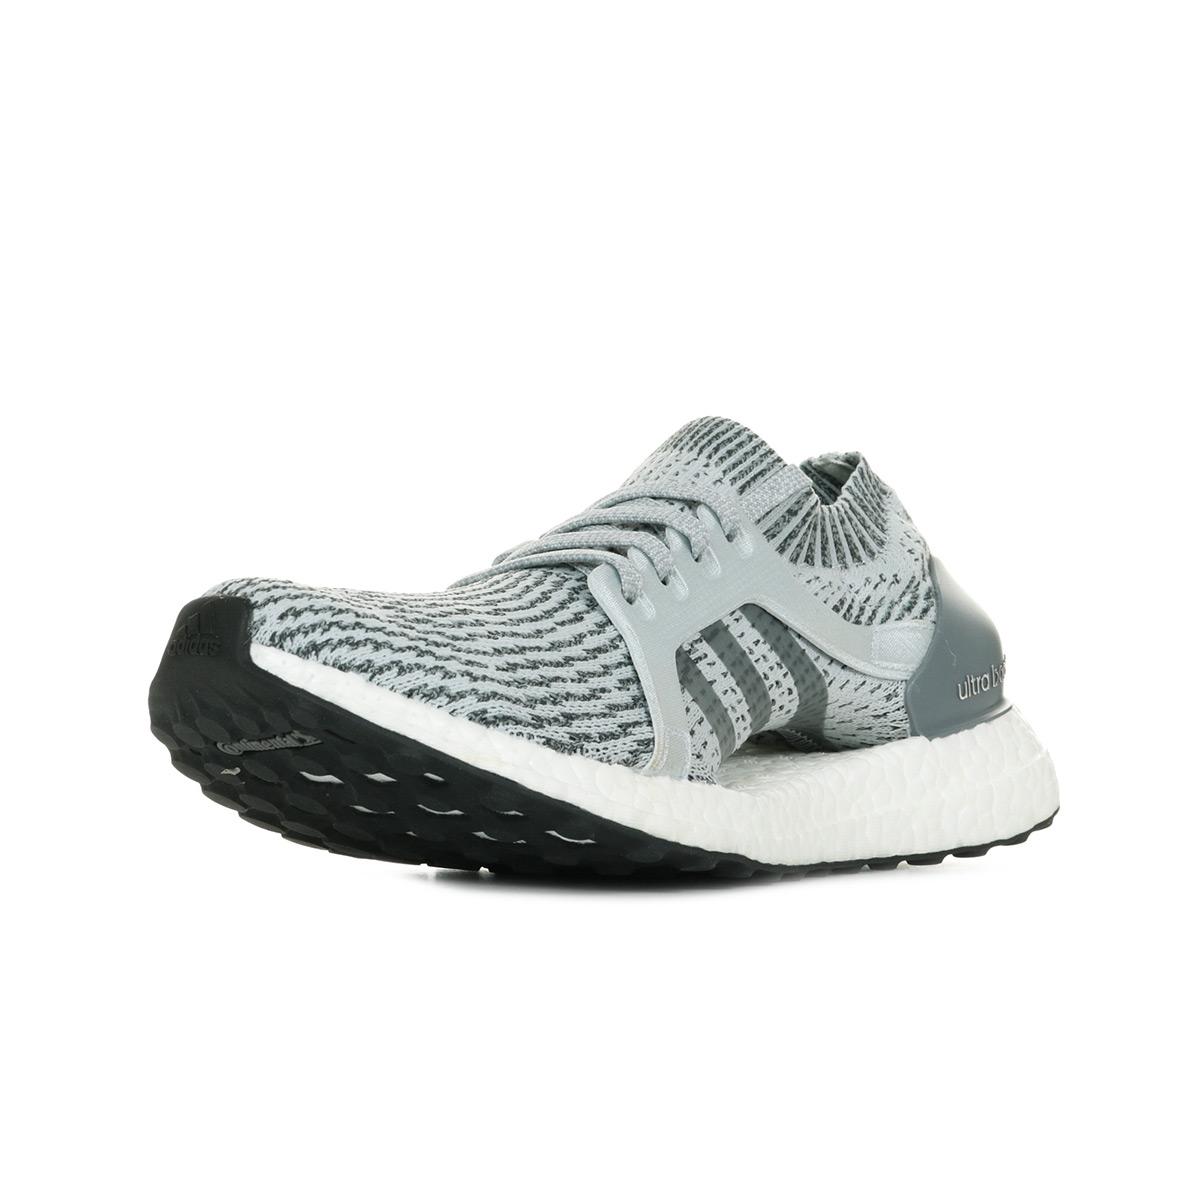 adidas Ultraboost X BB1695, Running